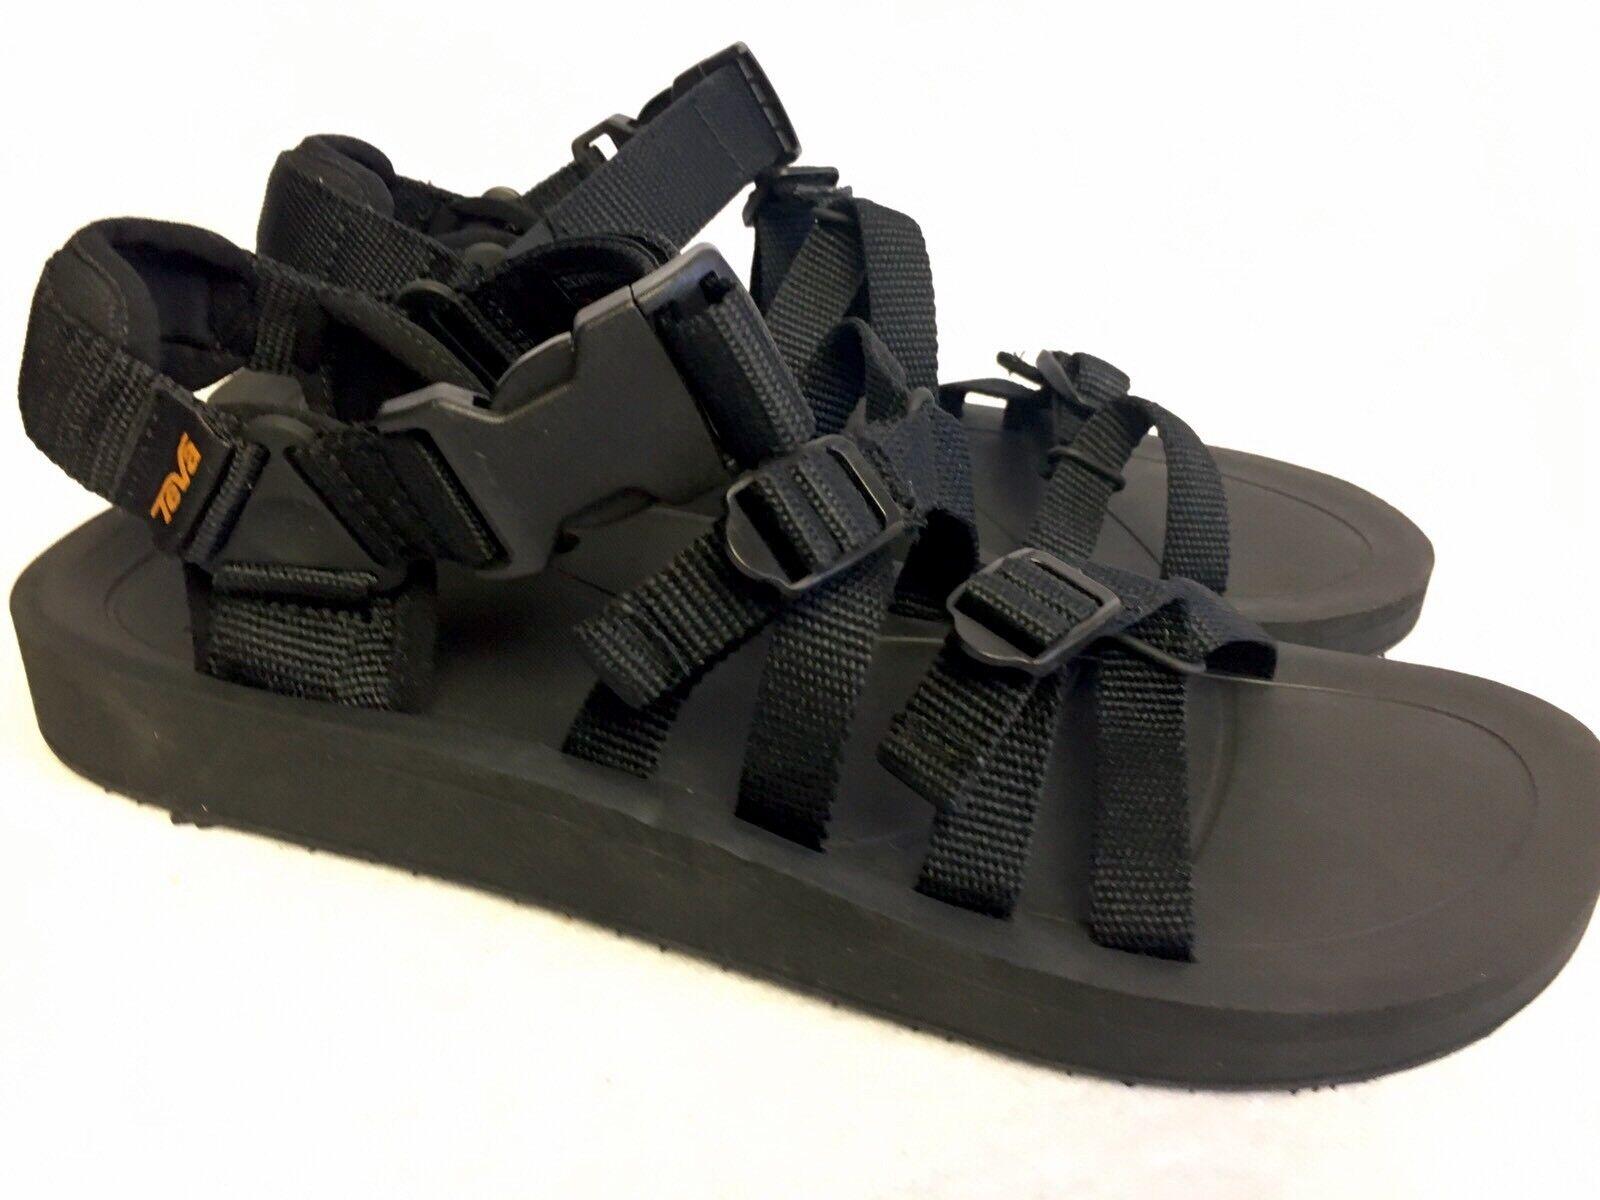 Teva Uomo Alp Premier Premier Premier Polyester Upper Casual Sandals nero Strappy 1015200 New 6eff60